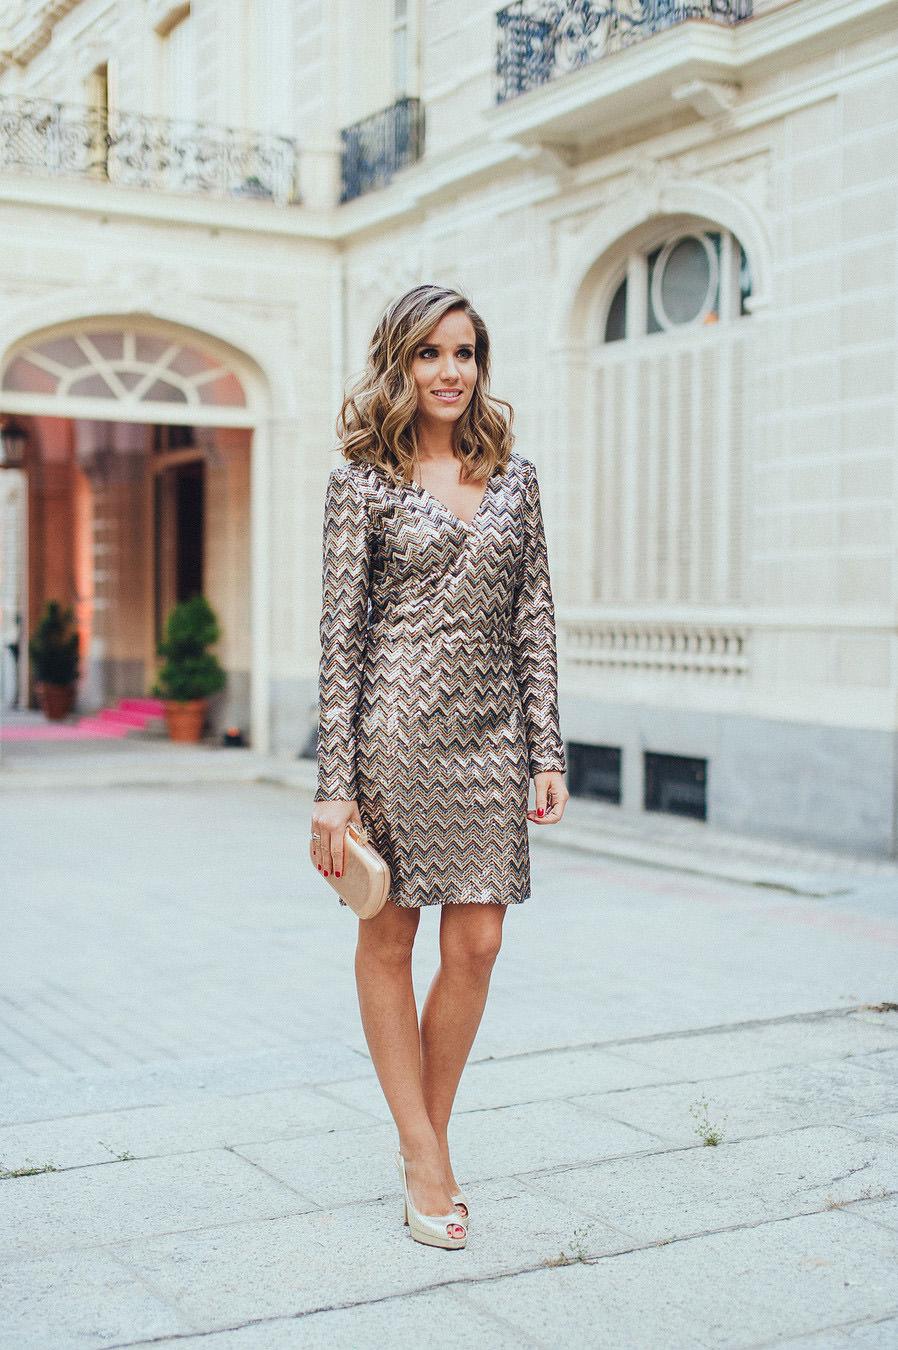 calista-one-lista-de-bodas-online-blog-de-bodas-bossanova-looks-invitadas-jeremy-sanders-1